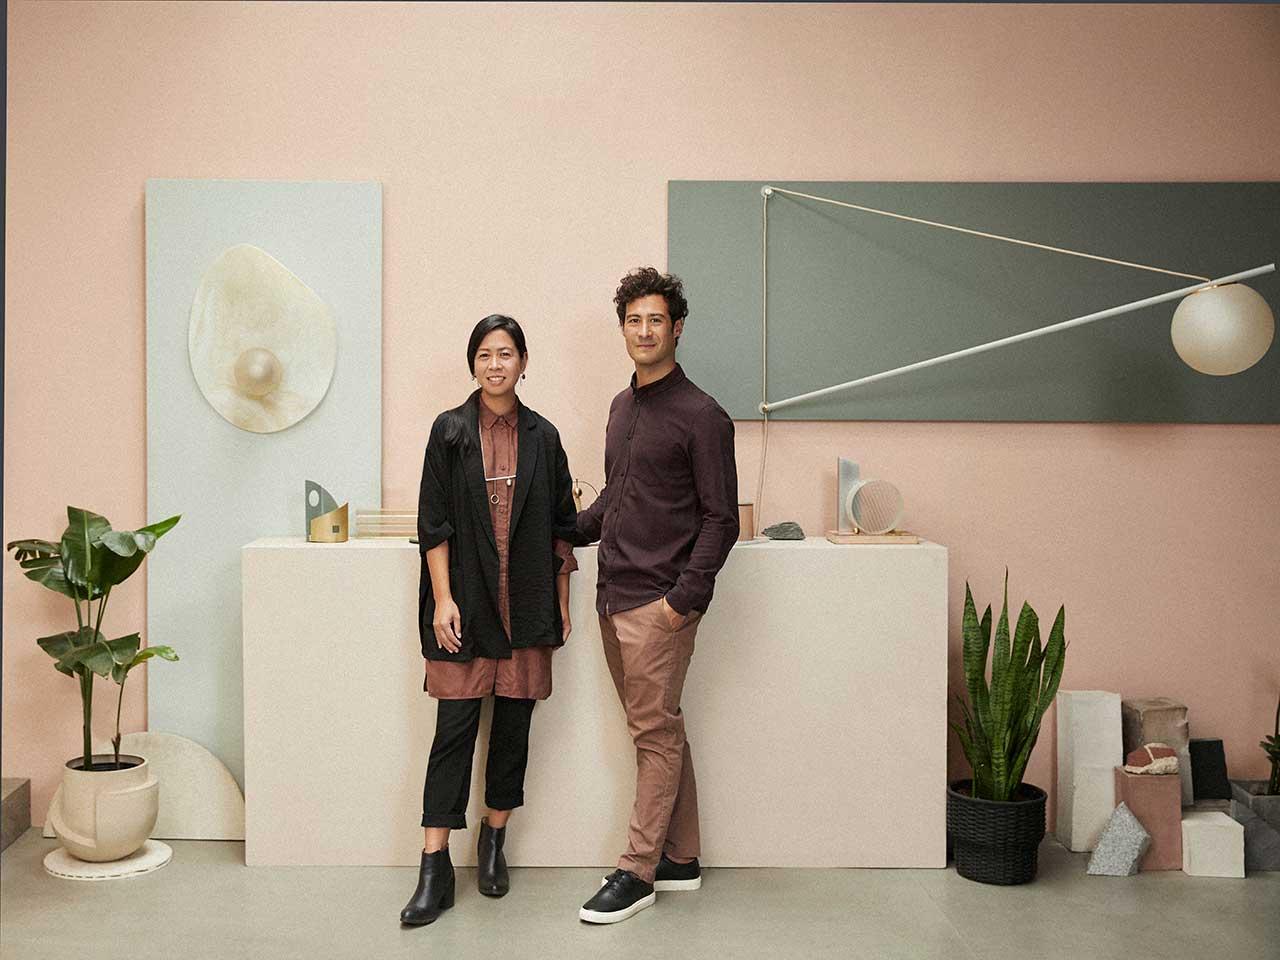 The place I Work: Women & Gents Studio